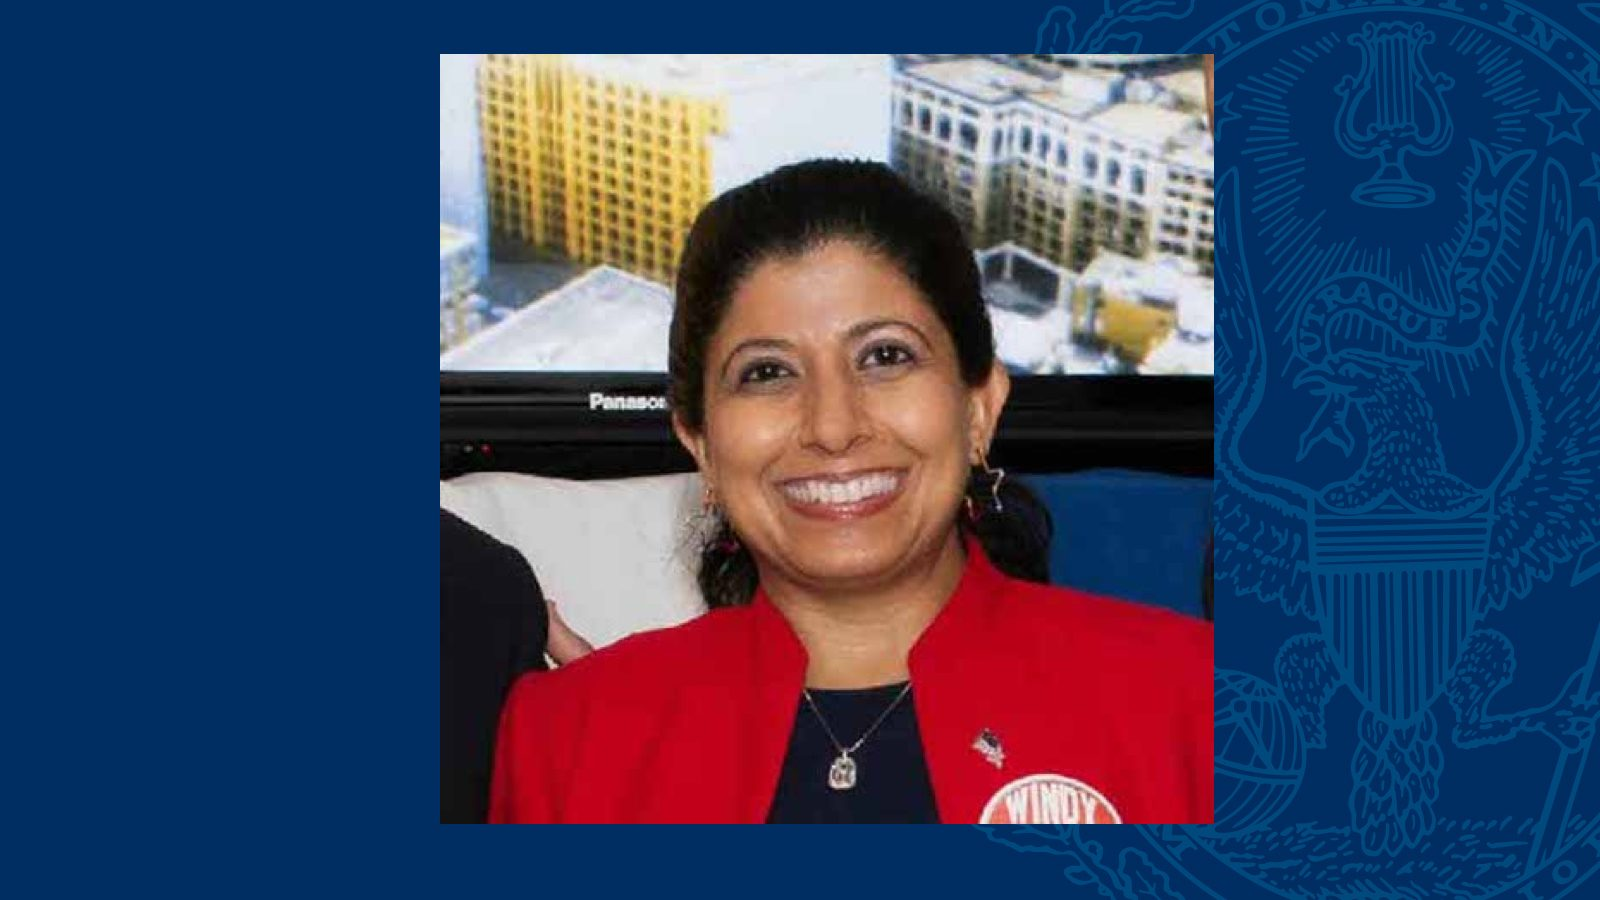 Nazima Razick wears a red blazer in a square headshot on a blue background